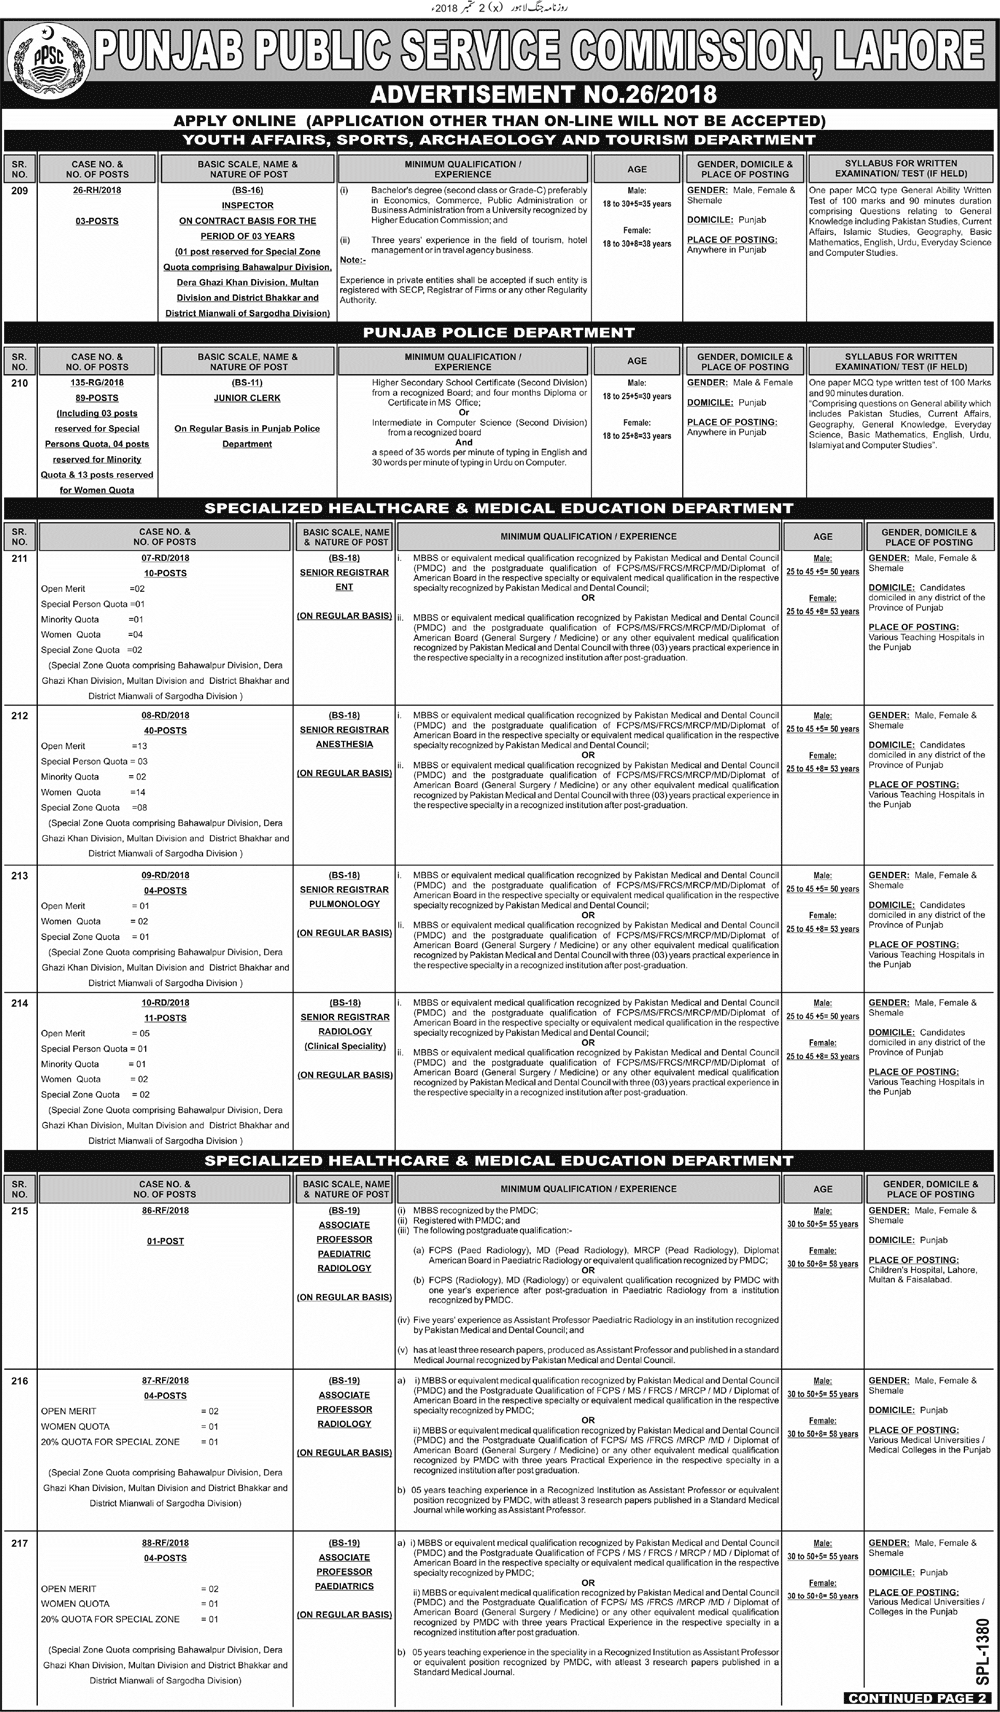 Punjab Police Junior Clerk Jobs 2018 Male, Female Form Last Date